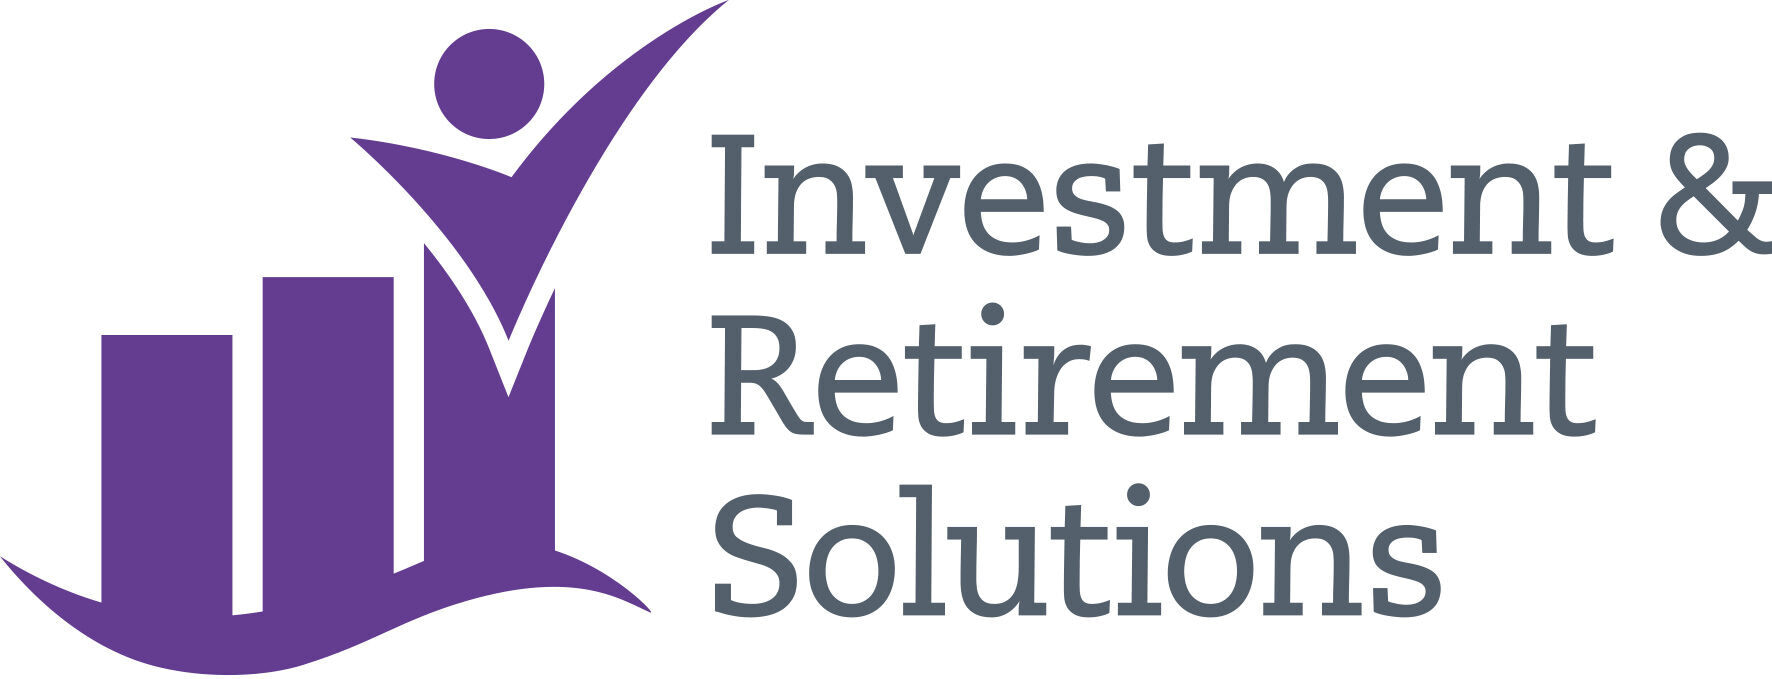 Investment & Retirement Solutions Ltd